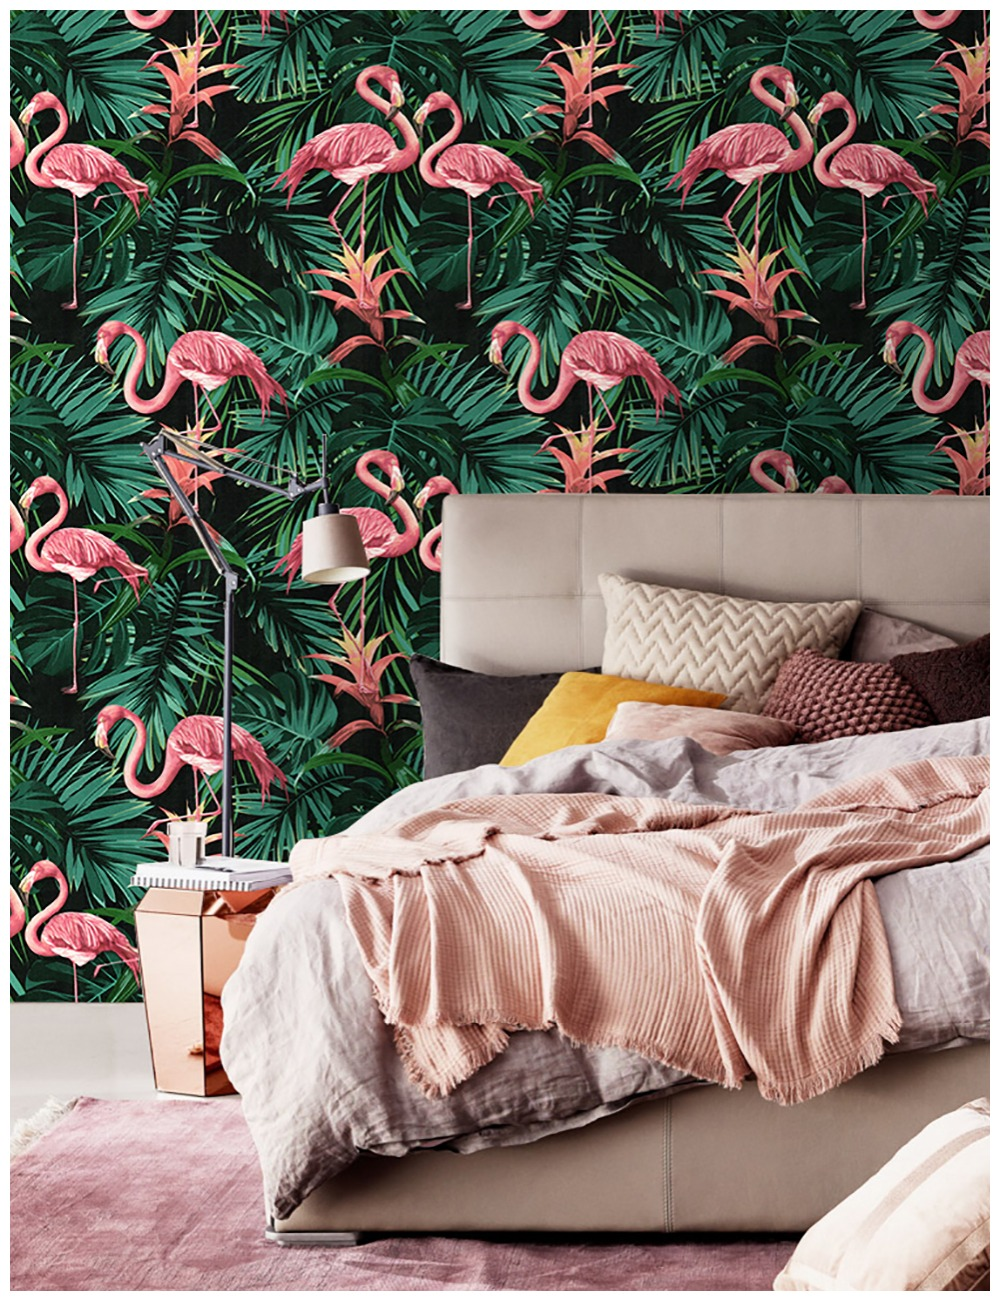 Haokhome Vintage Flamingo Wallpaper 0 53m 10m Leaf Contact Paper Green Black Pink Living Room Bedroom Home Bathroom Decor Wallpapers Aliexpress